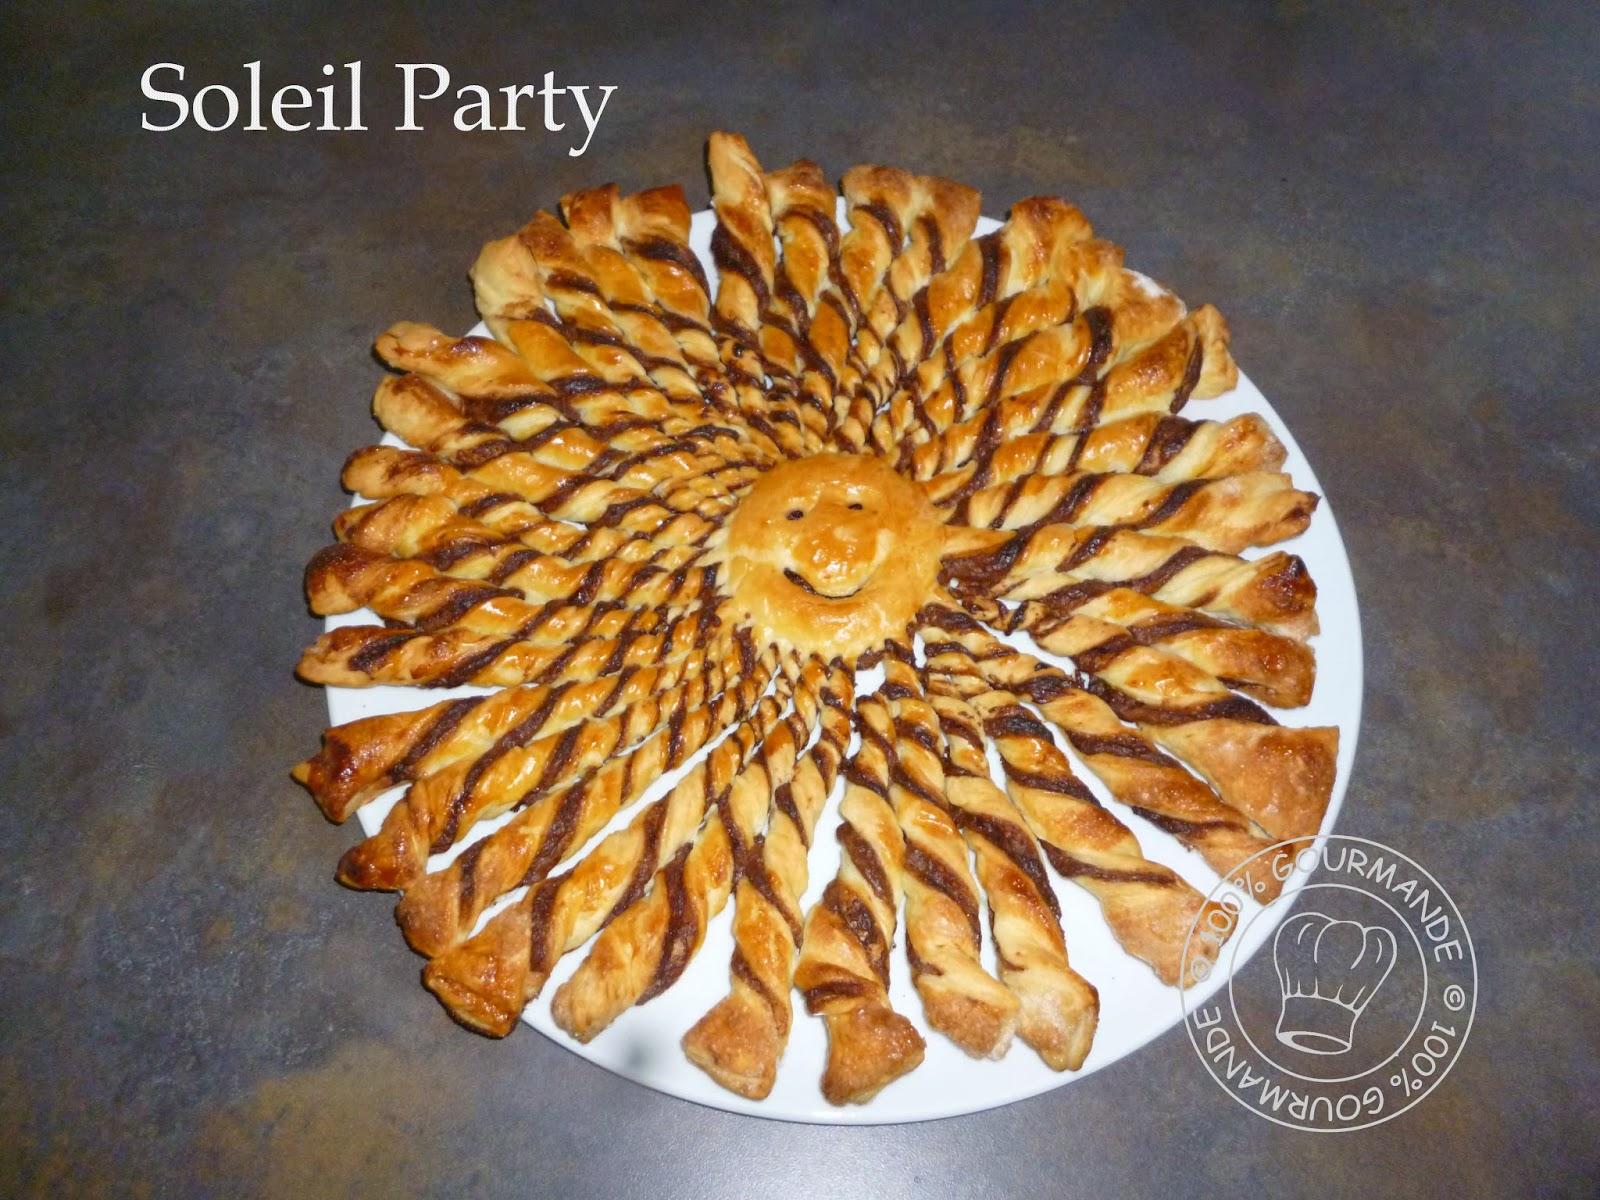 100 gourmande soleil party - Pate feuilletee nutella soleil ...